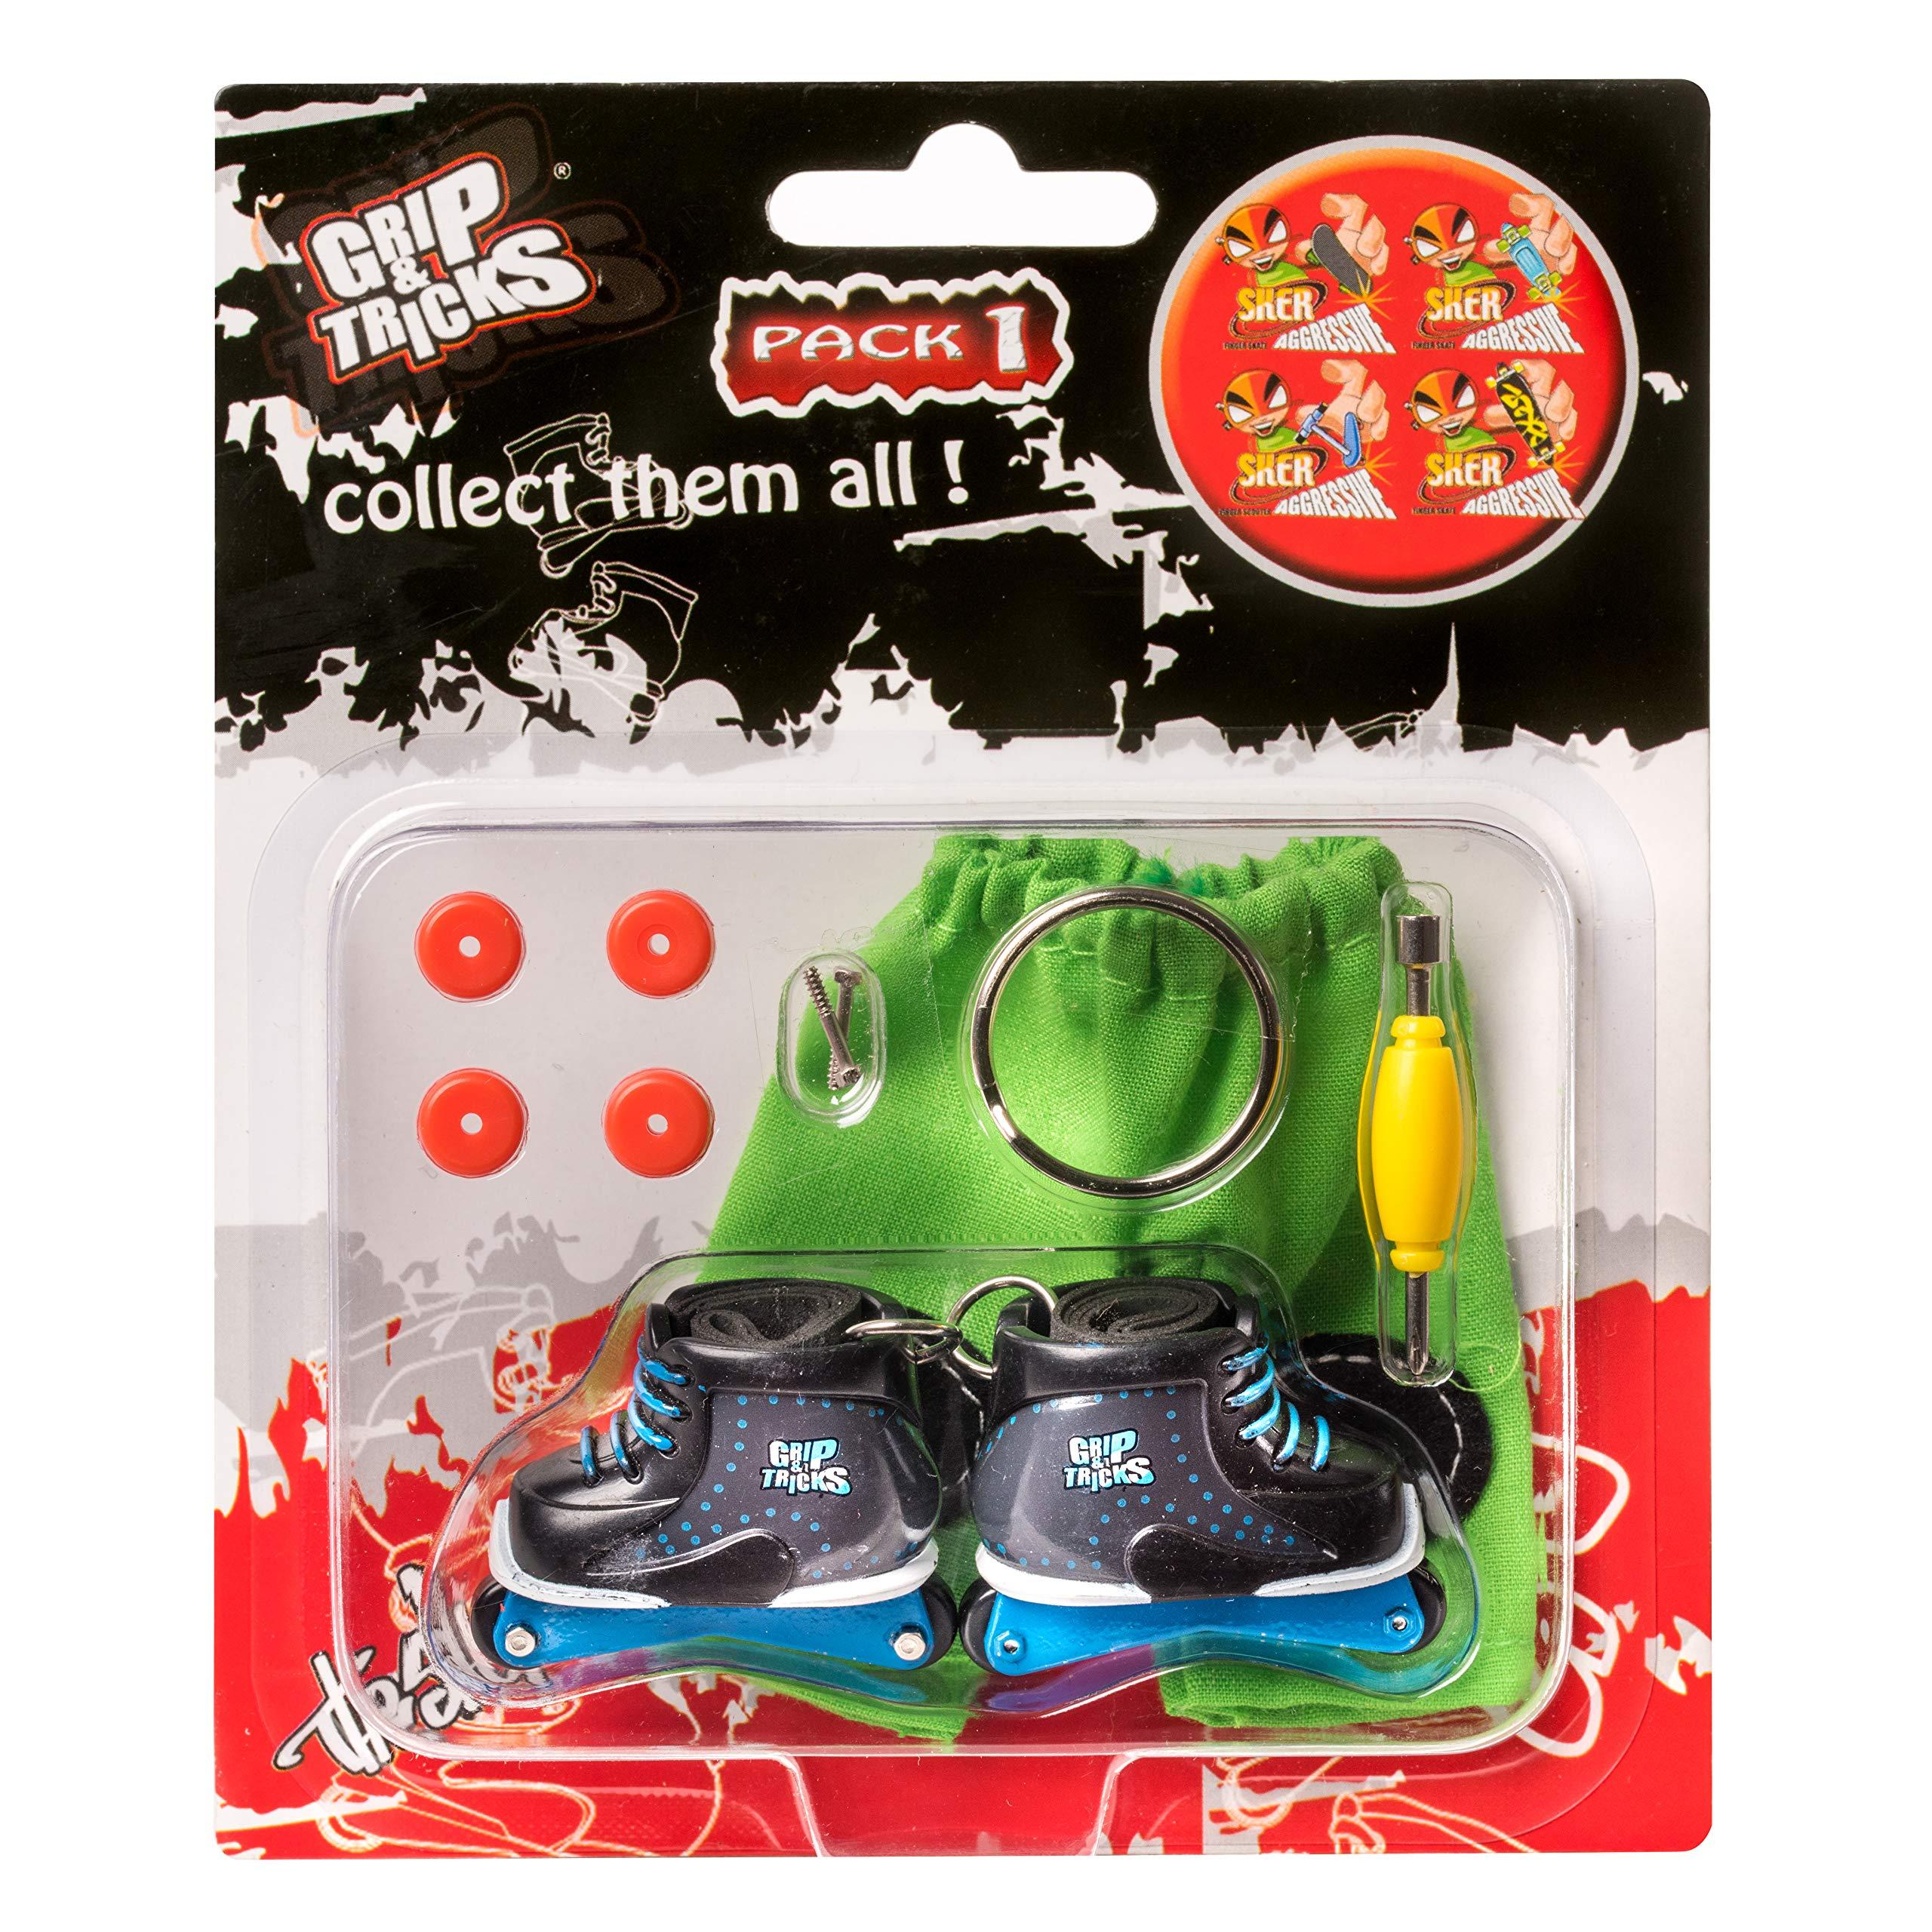 Grip & Tricks - Finger Roller - Mini Inline Skates Freestyle Pack1